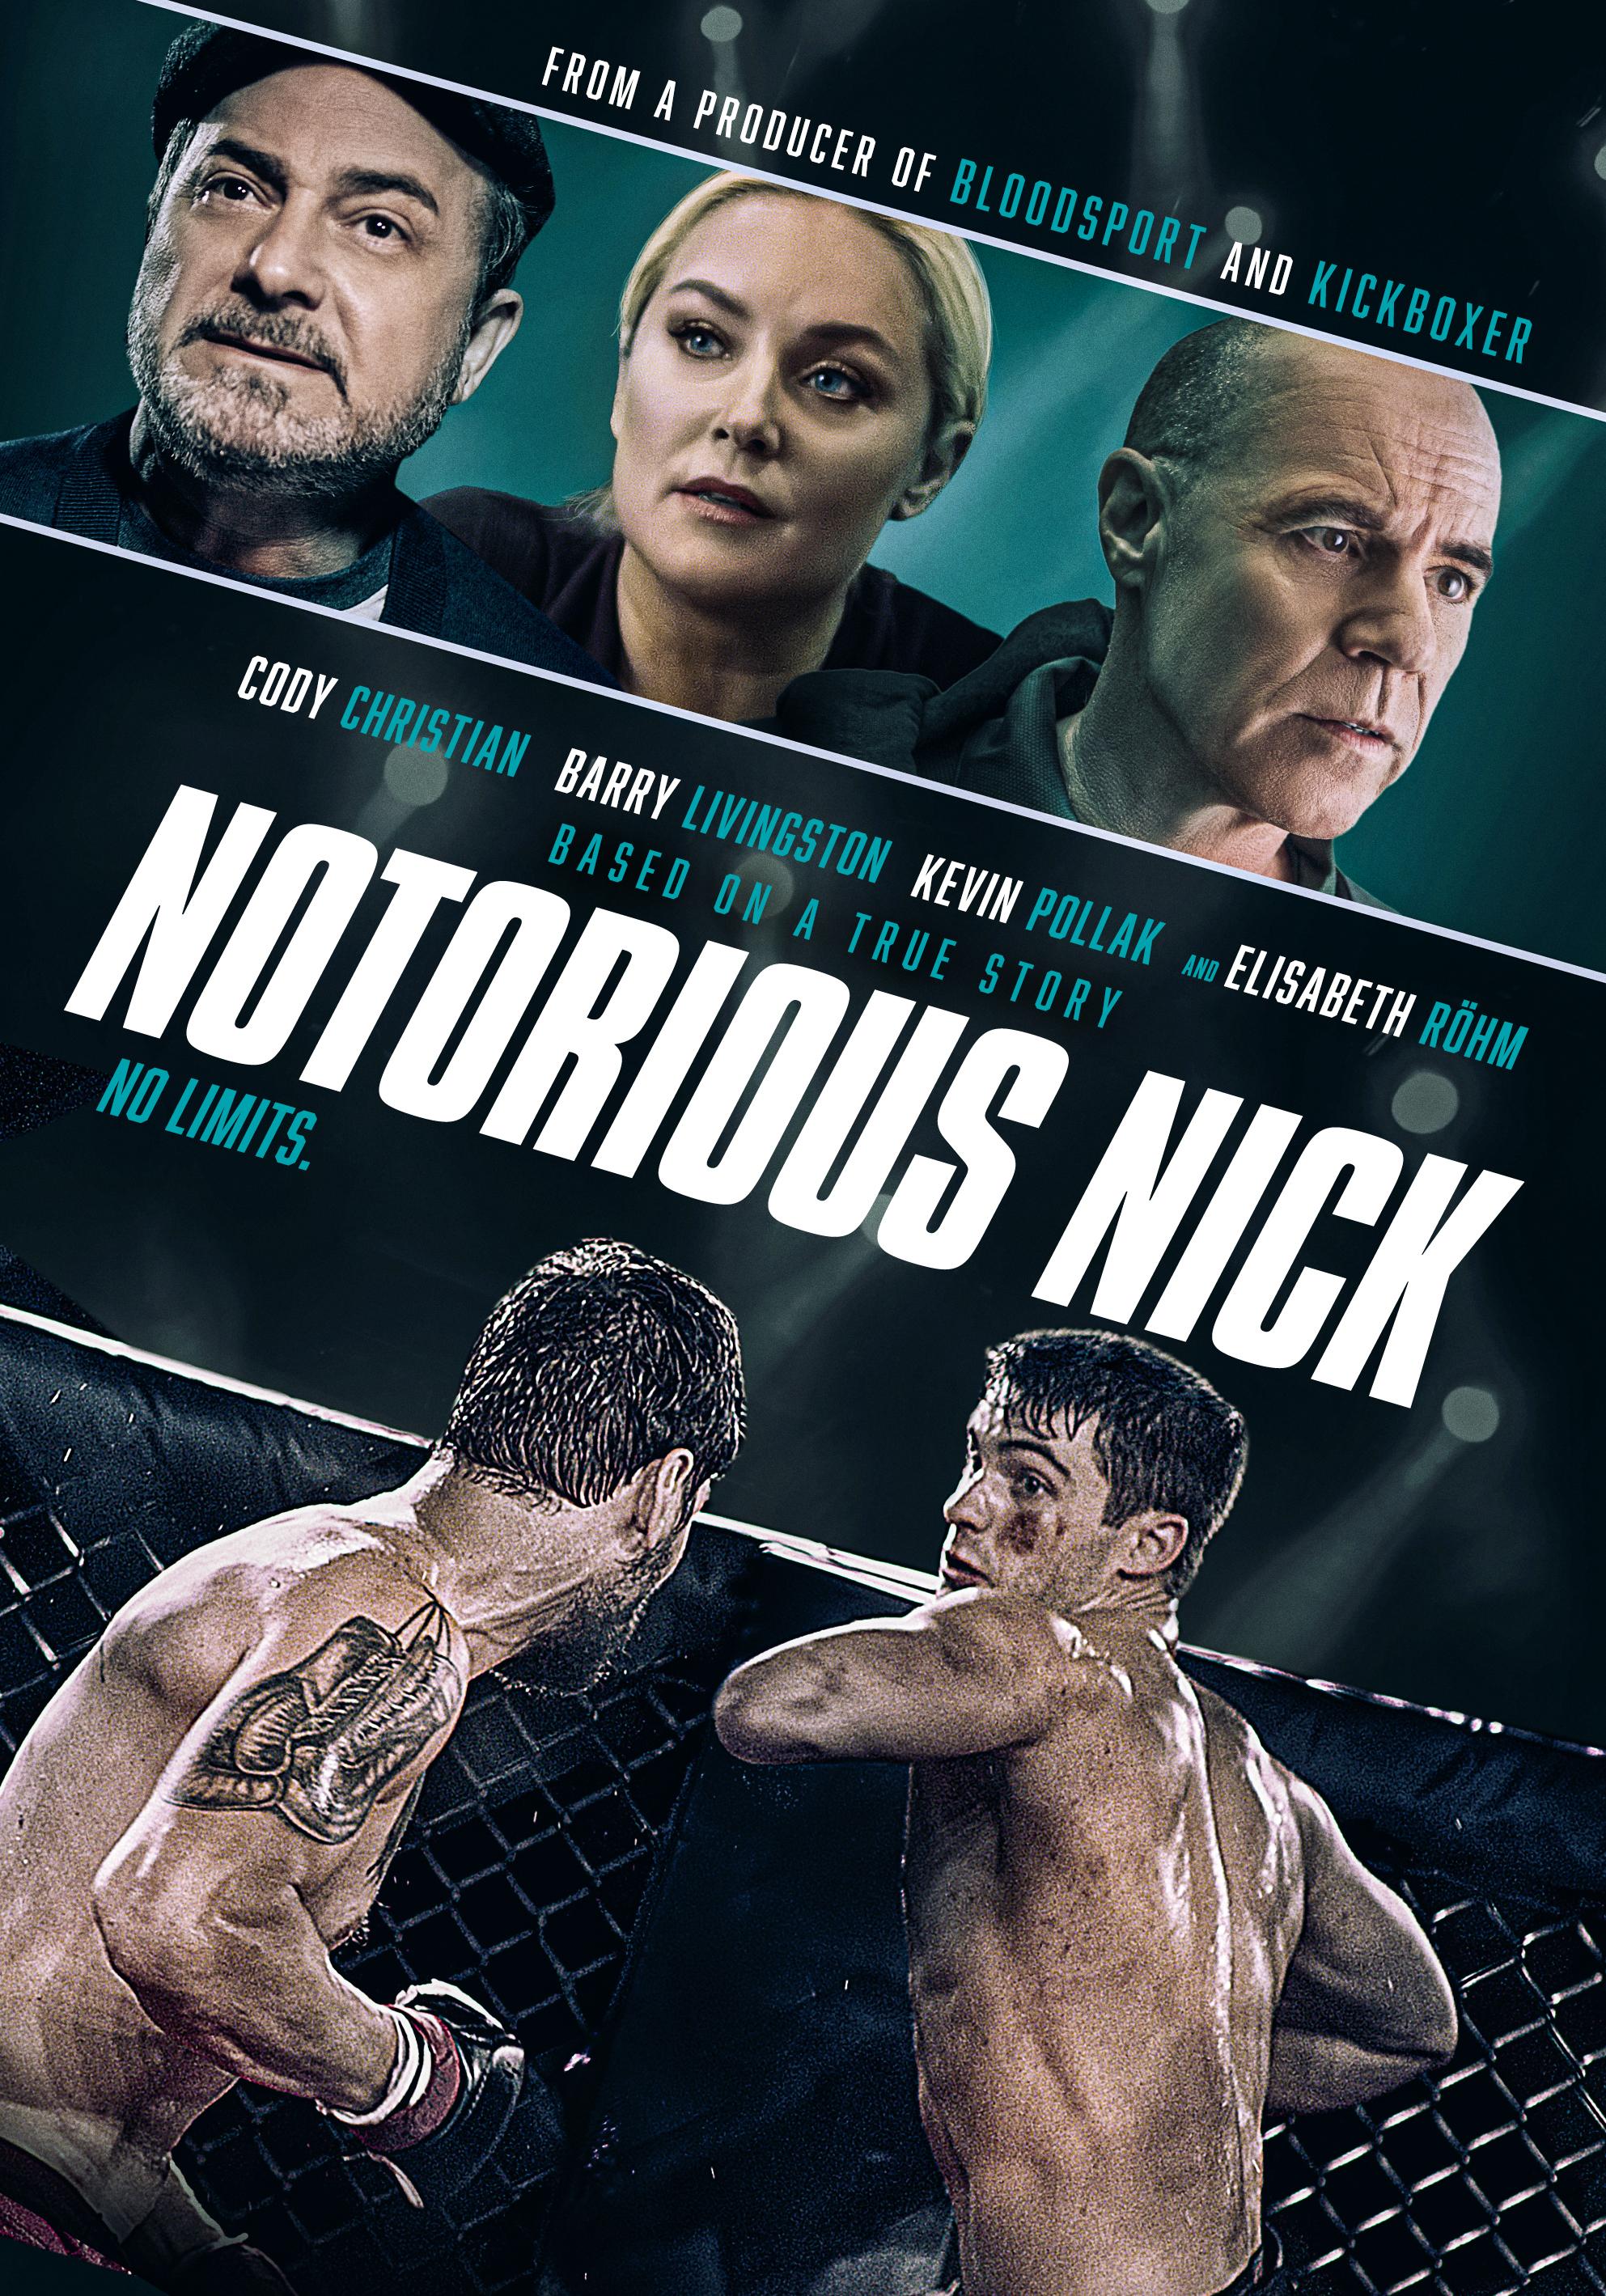 Phim Đấu Sĩ Nick - Notorious Nick (2021)